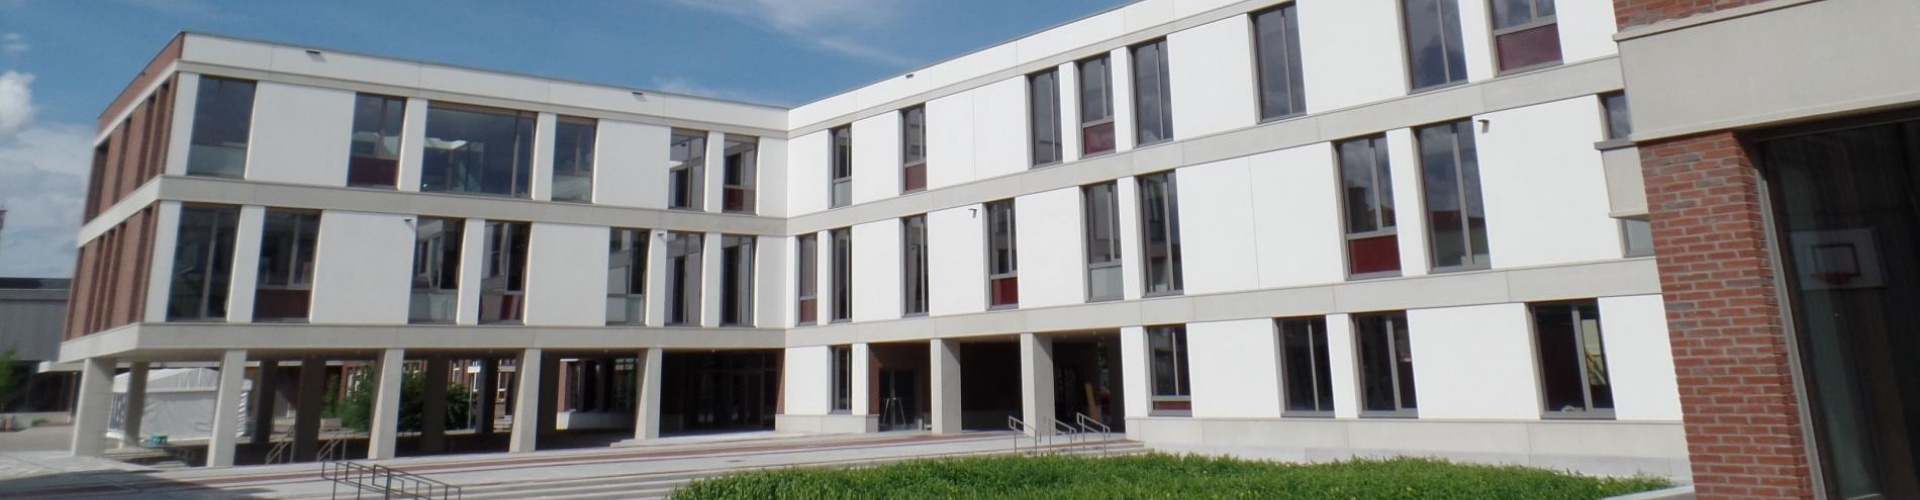 Sint-Aloysiusinstituut Geel